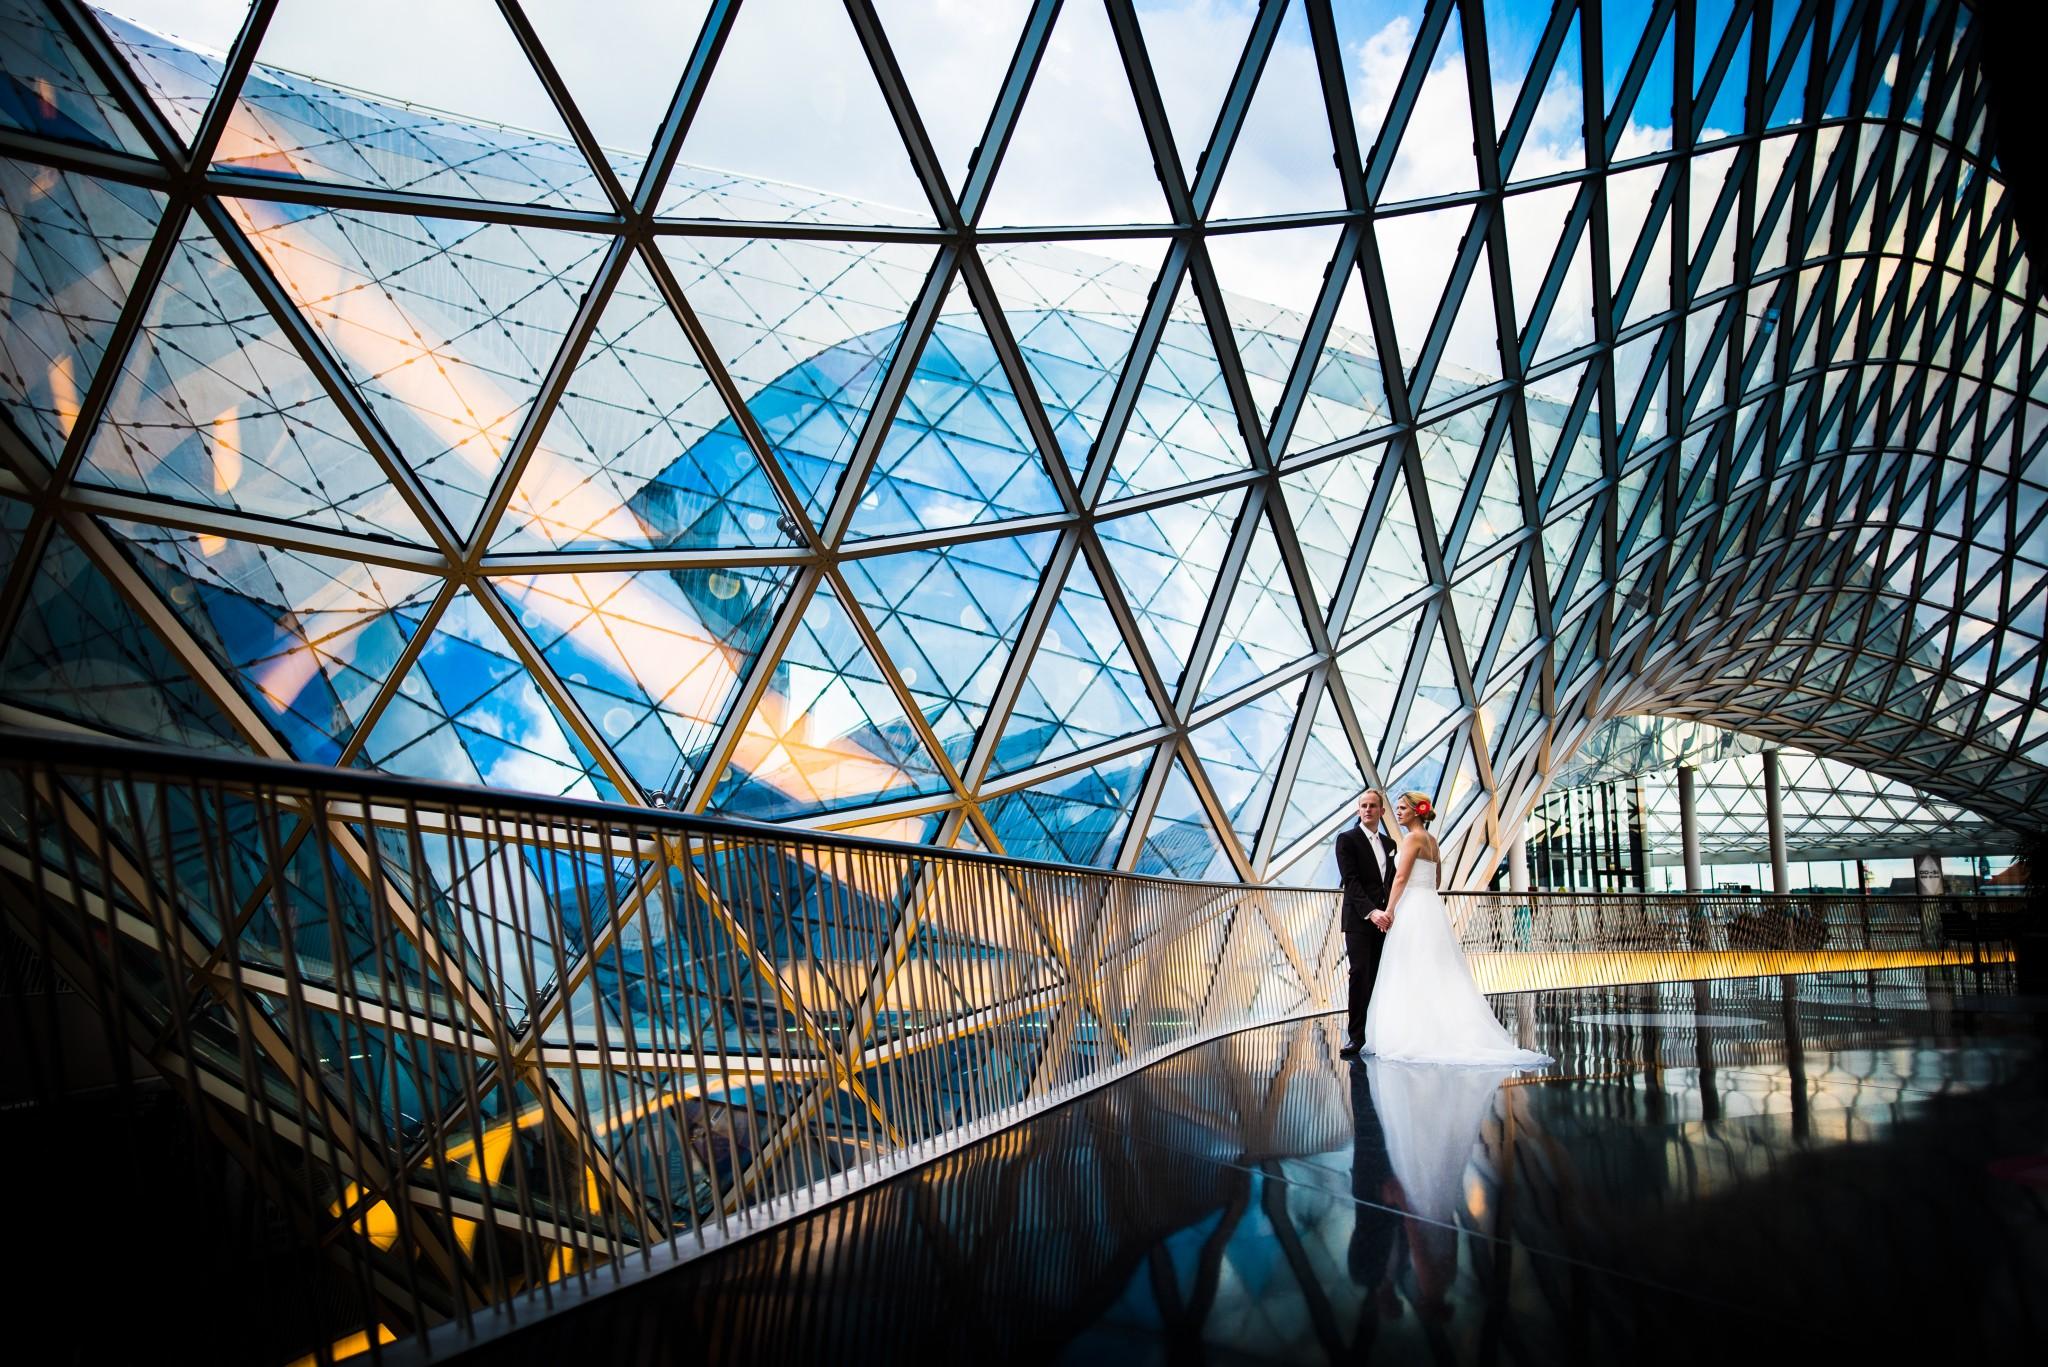 Hochzeitsfotograf-Frankfurt 20150903-184140-5936